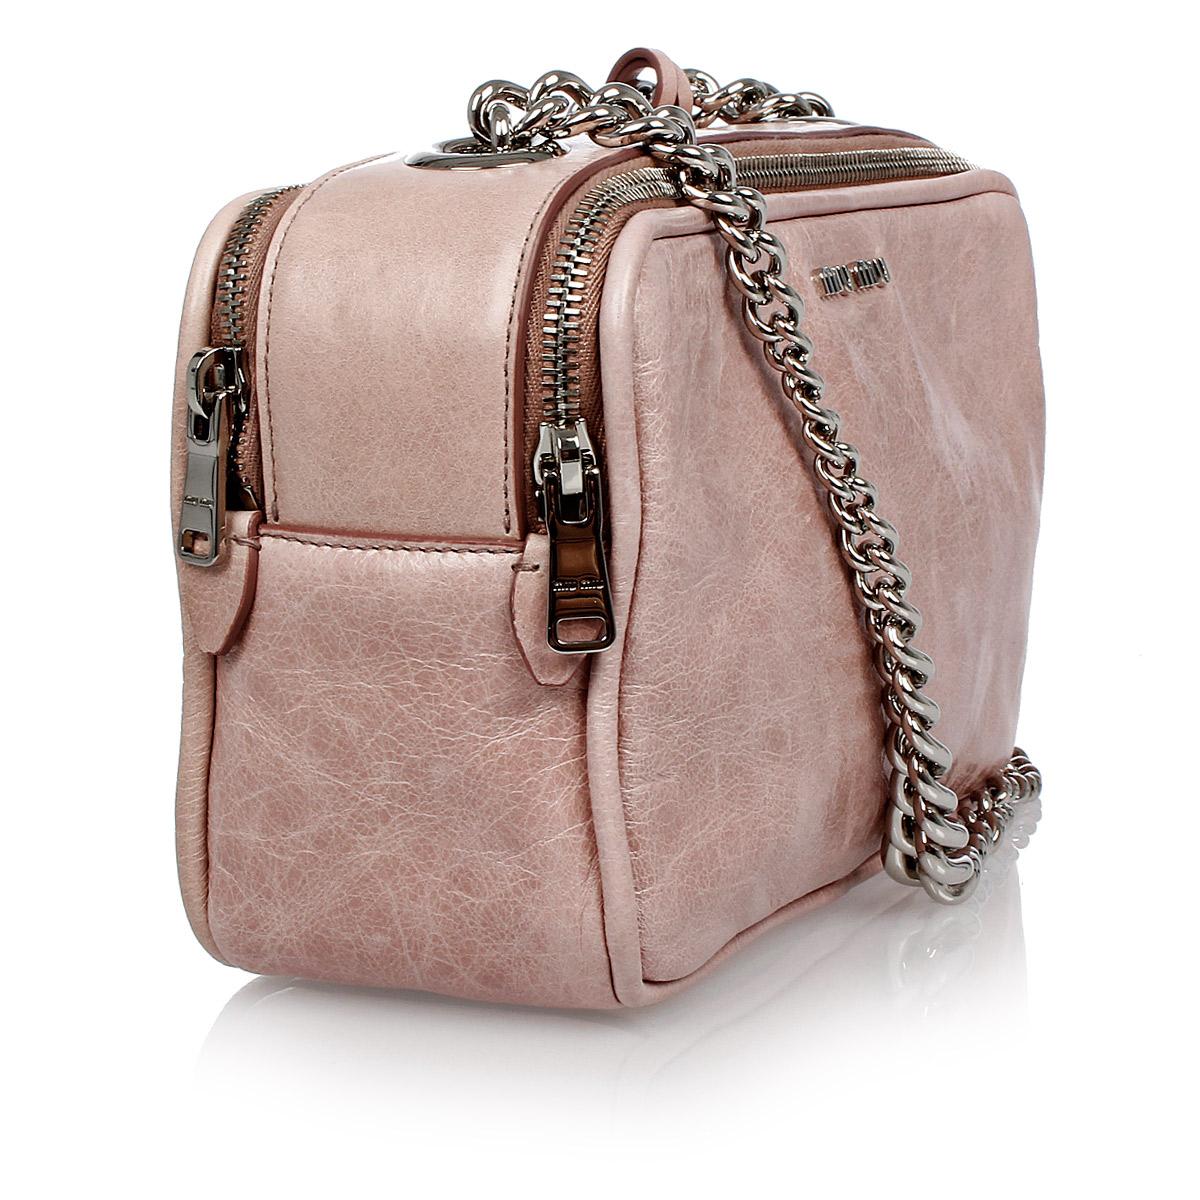 Borse A Spalla Miu Miu : Miu donna mini borsa a spalla glamood outlet